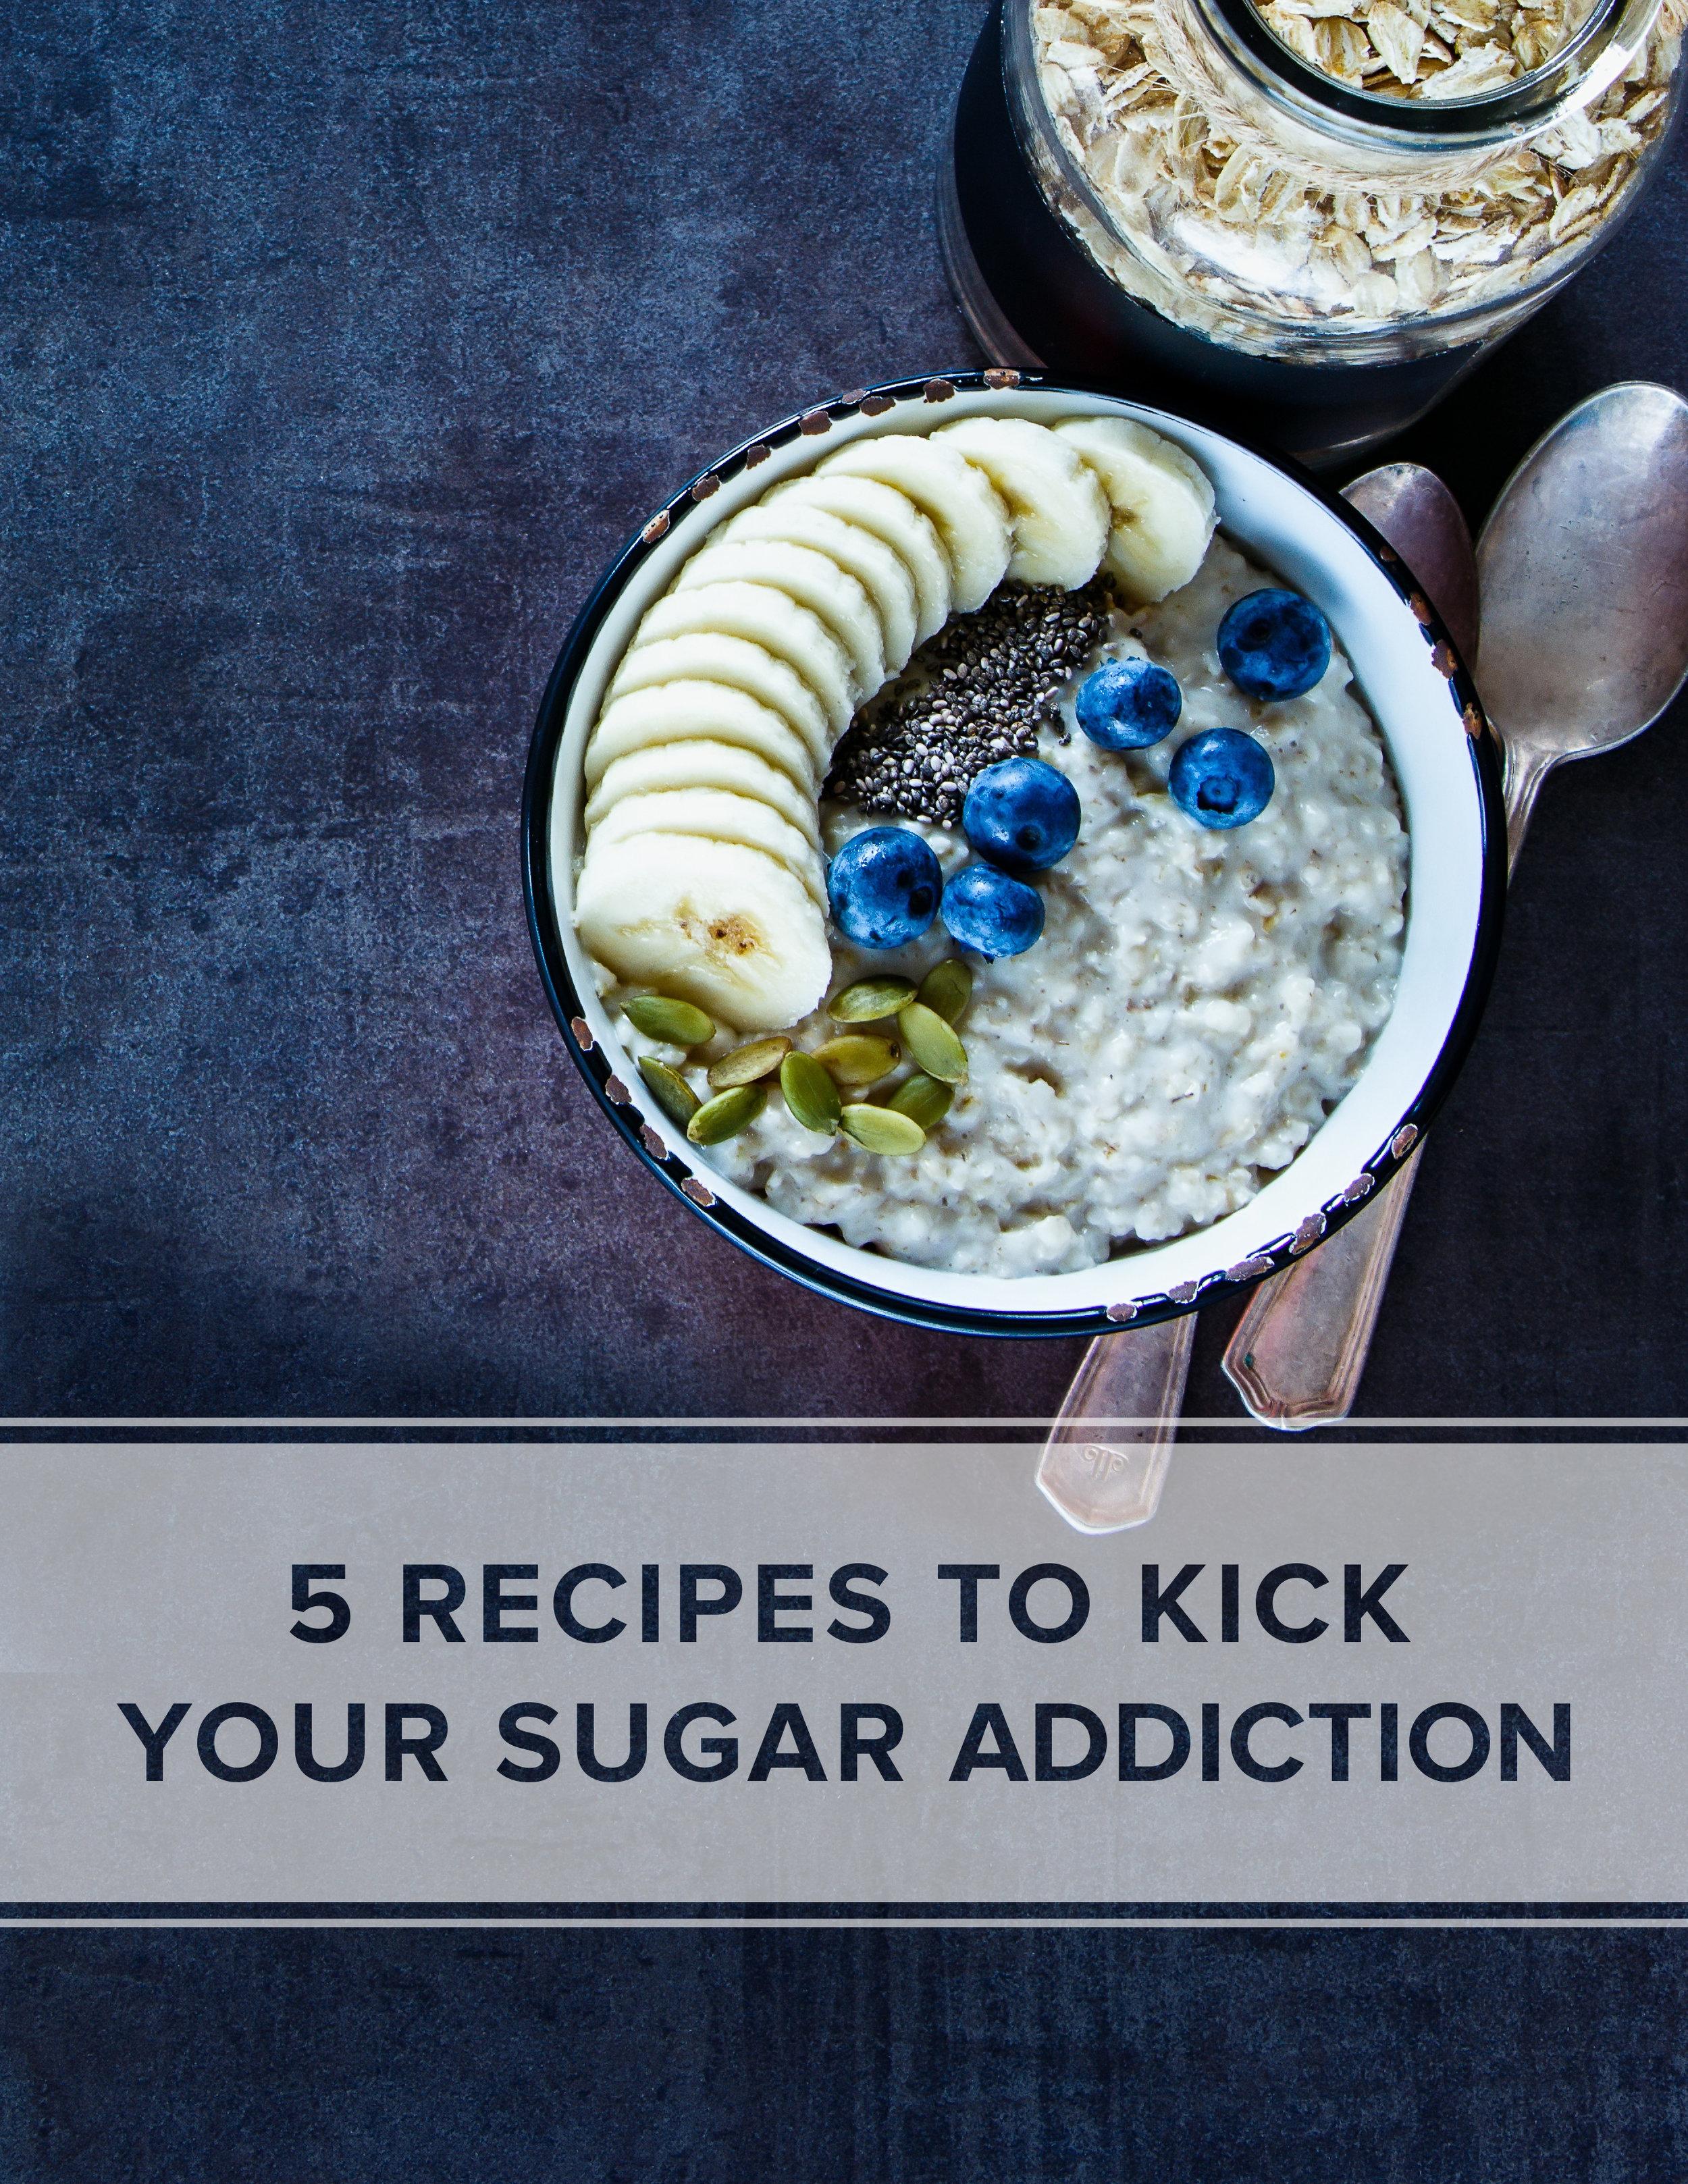 5_Recipes_To_Kick_Your_Sugar_Addiction_2D_cover.jpg